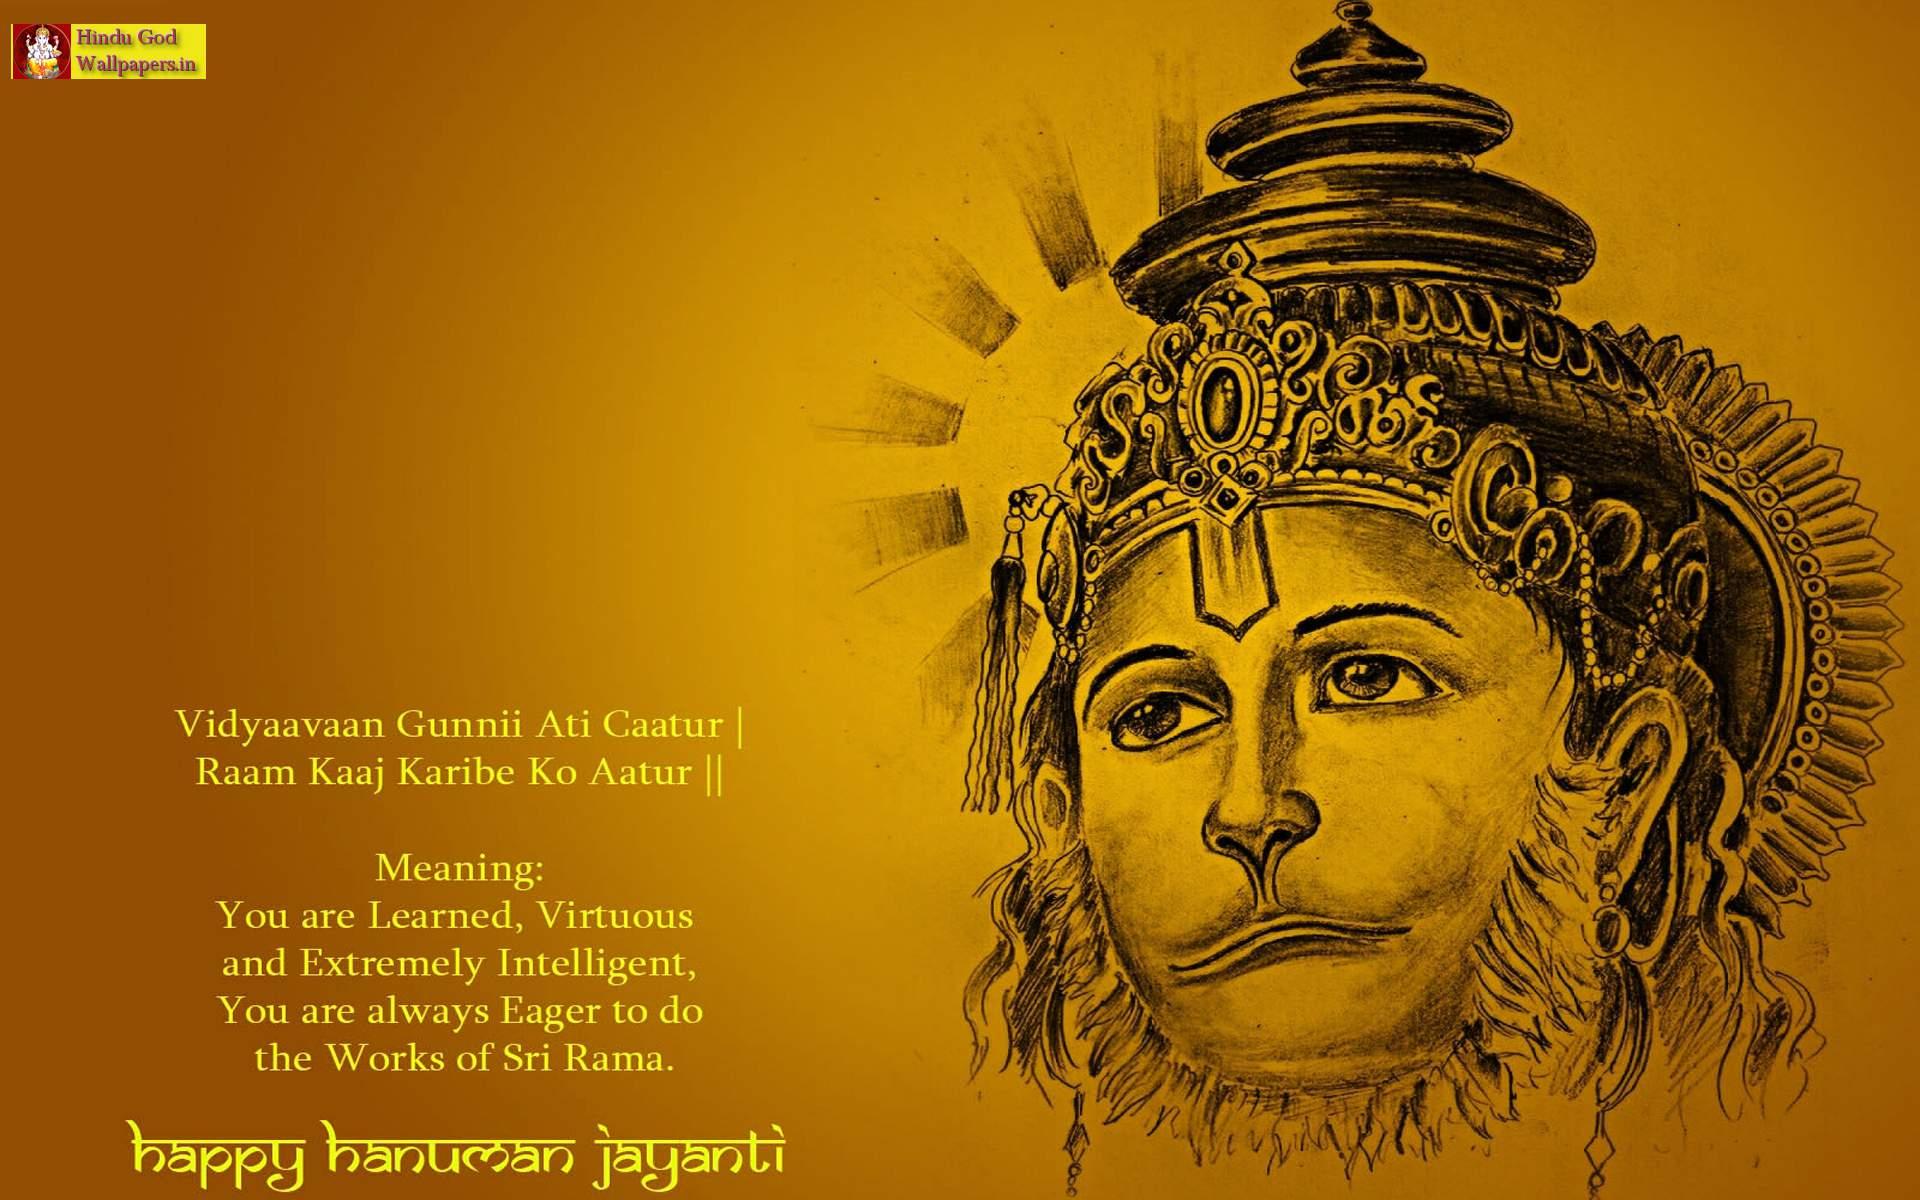 Hanuman Jayanti Wallpaper